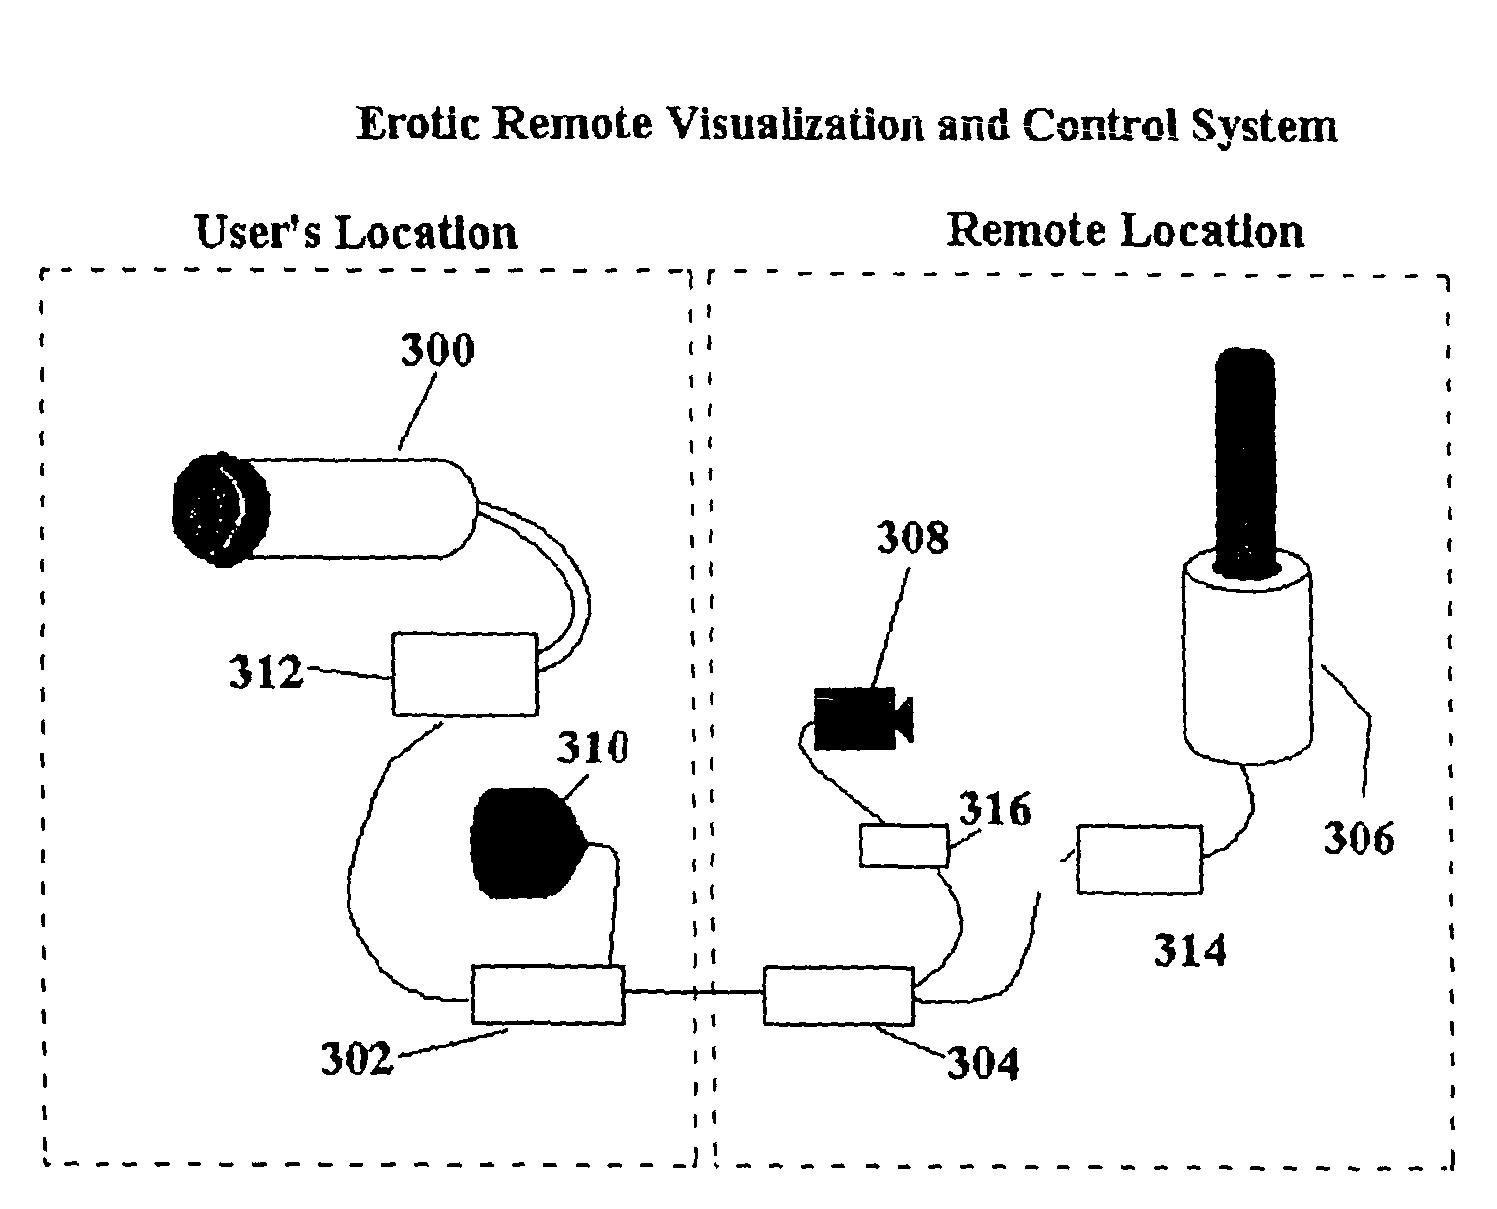 Teledildonics patent